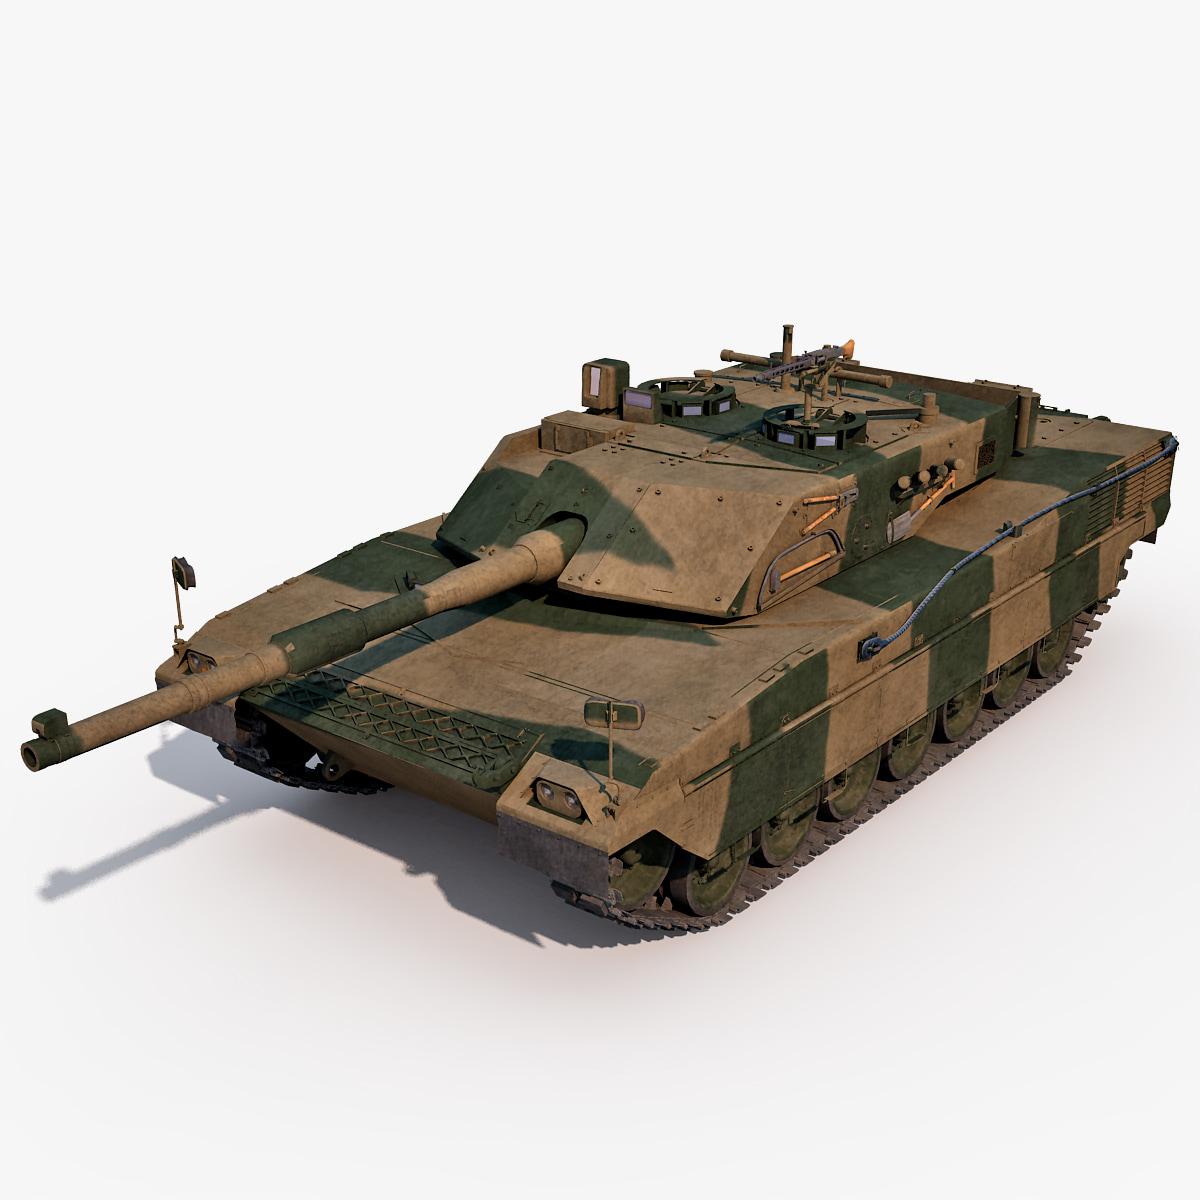 C1_Ariete_Italian_Battle_Tank_001.jpg